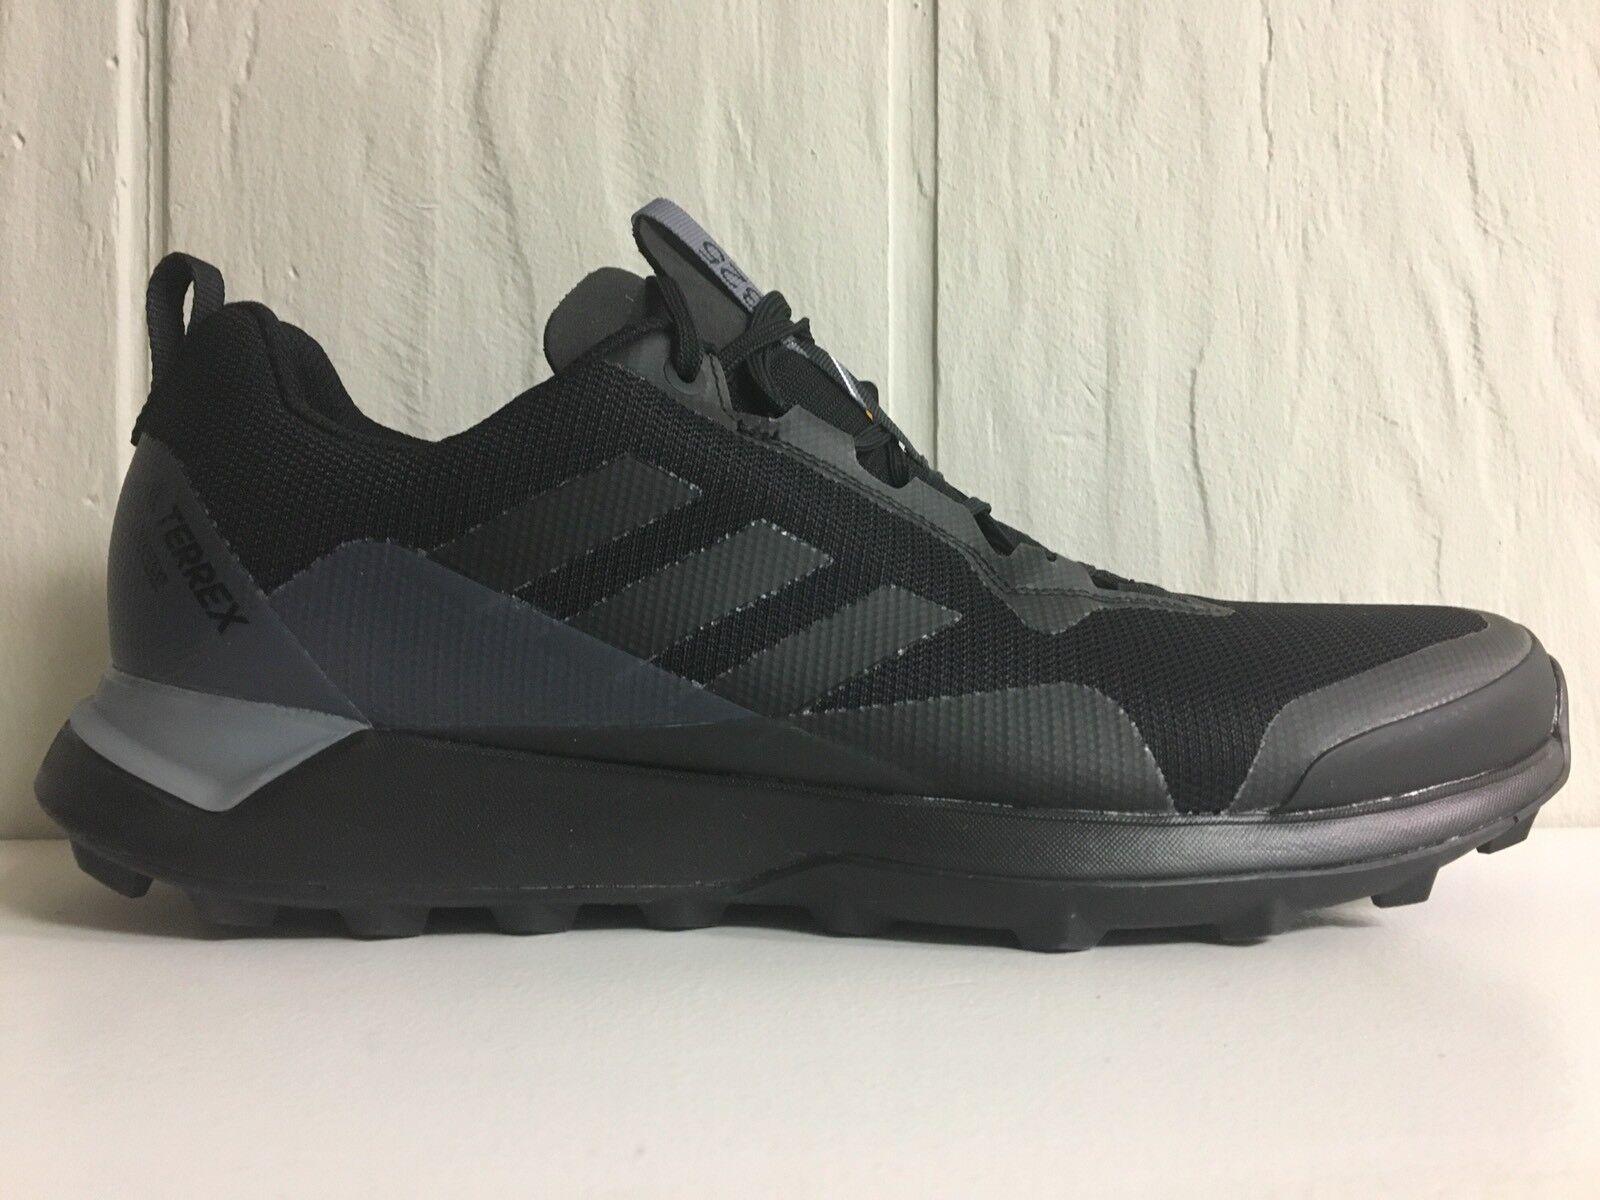 Adidas Herrengröße 10 Terrex CMTK Gore Tex GTX BY2770 Outdoor-Wanderschuhe Schwarz